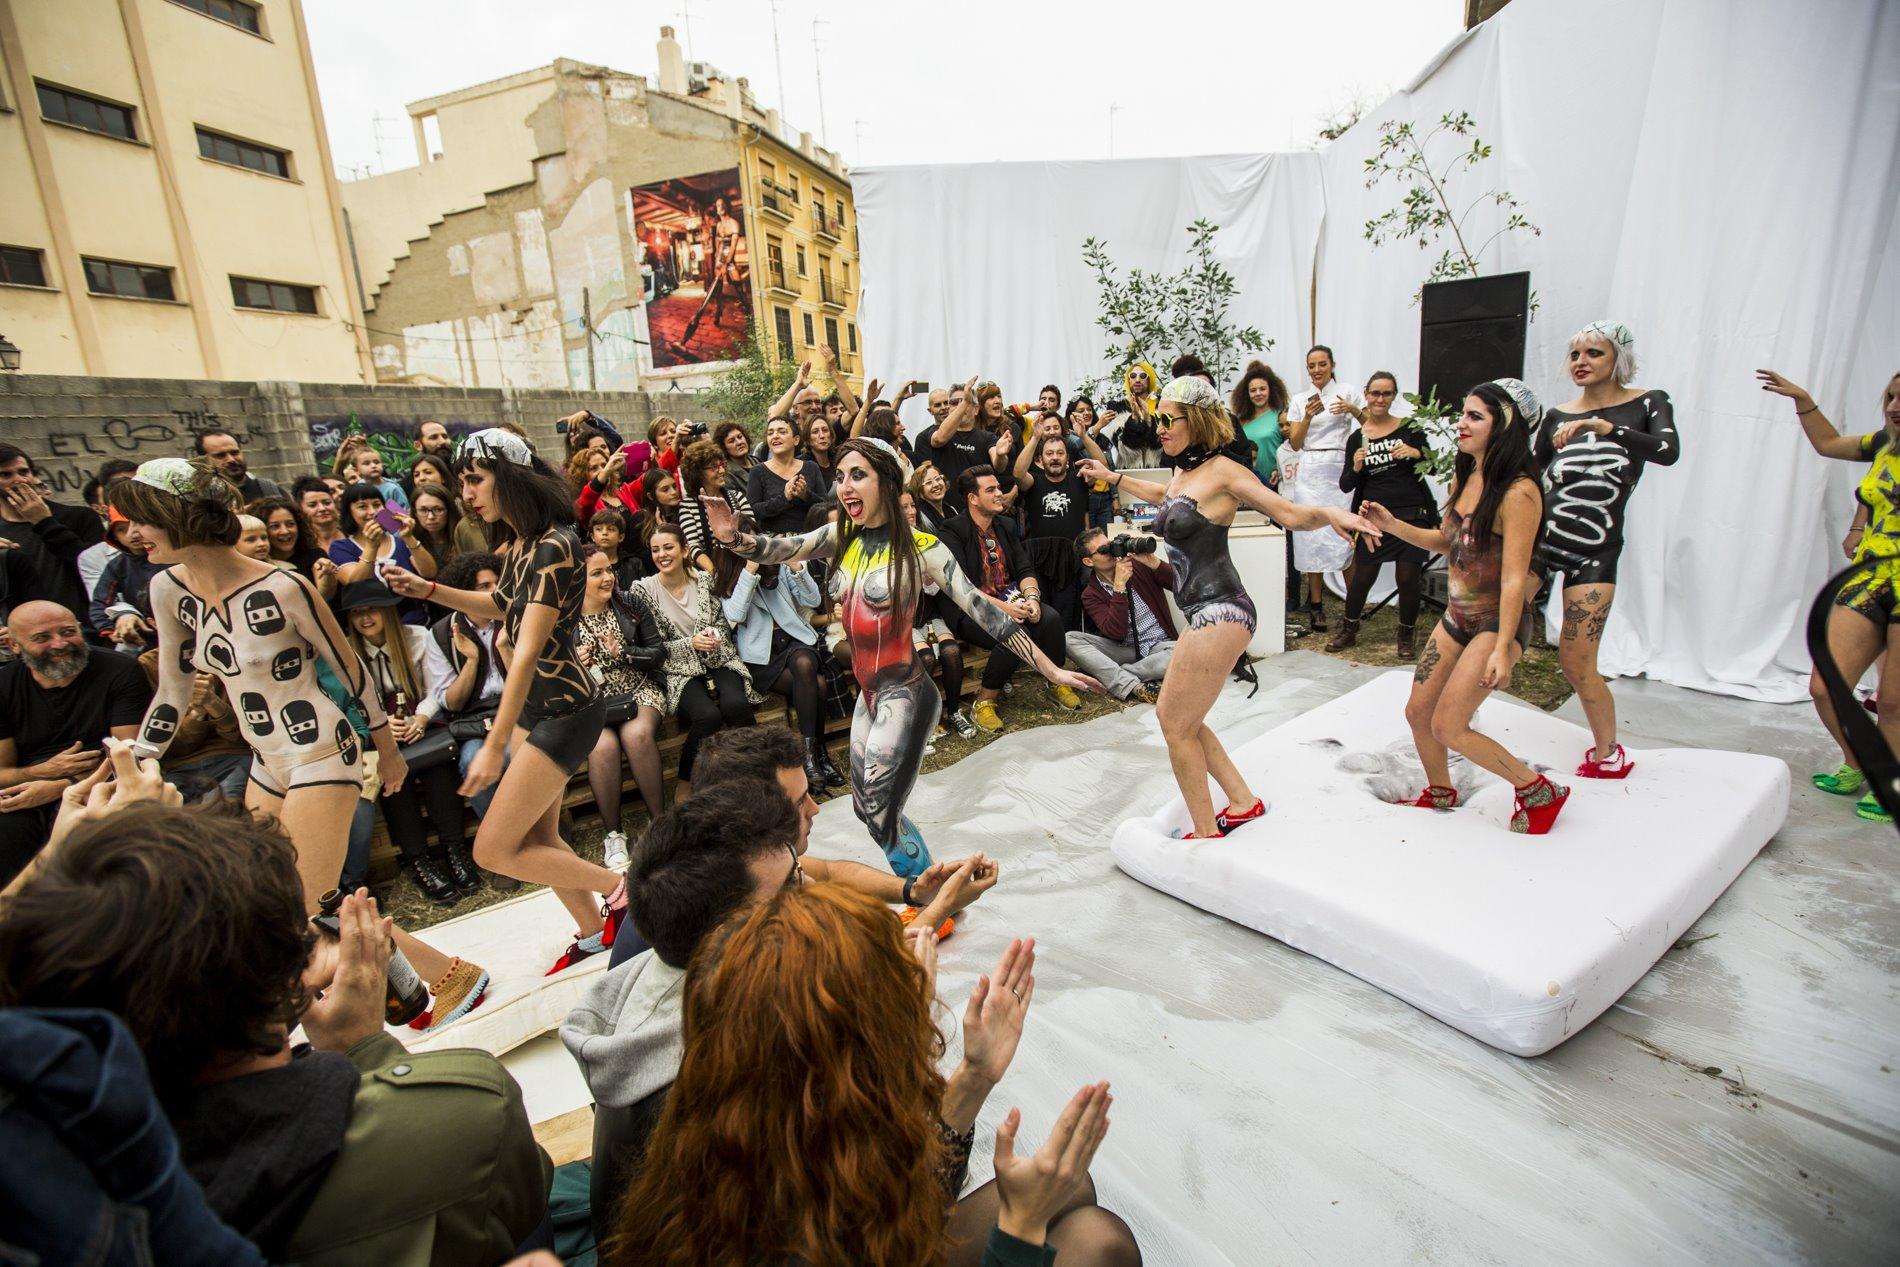 Isbel Messeguer ya participó en Intramurs con un desfile en el Instituto Valencià d'Art Modern (IVAM).